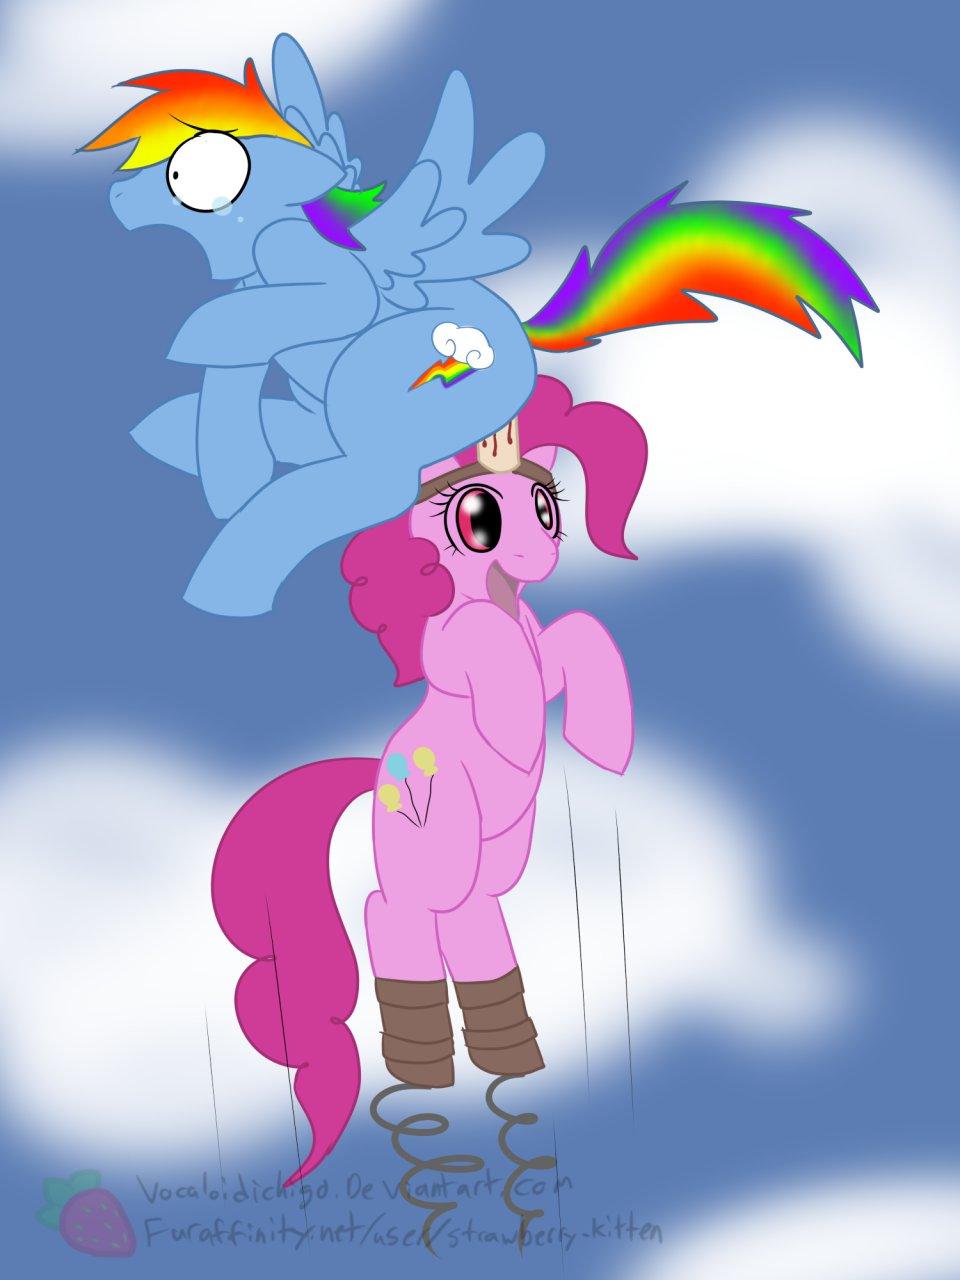 portal my rainbow little dash Princess zelda smash ultimate fanart